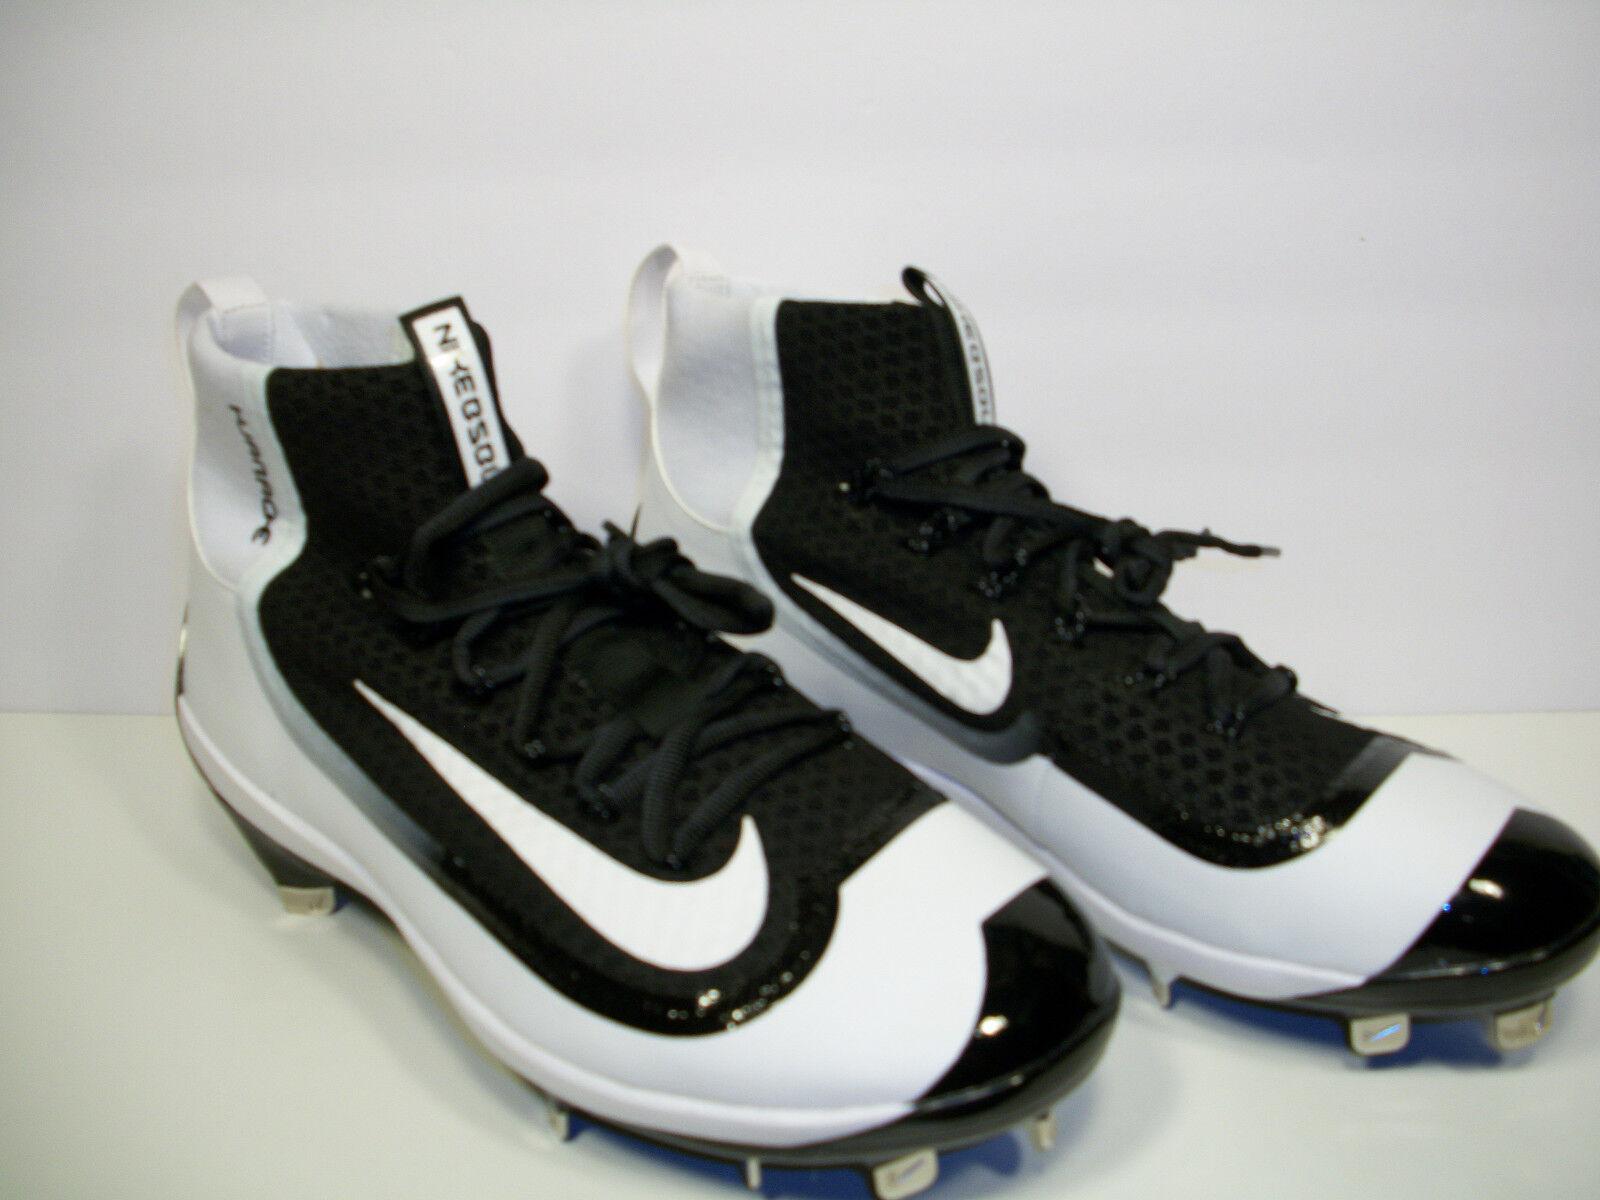 Nike Air huarache metal Elite Baseball cleats 2K mugre Elite metal 749359-010 BLK / WHT 12 2693d7